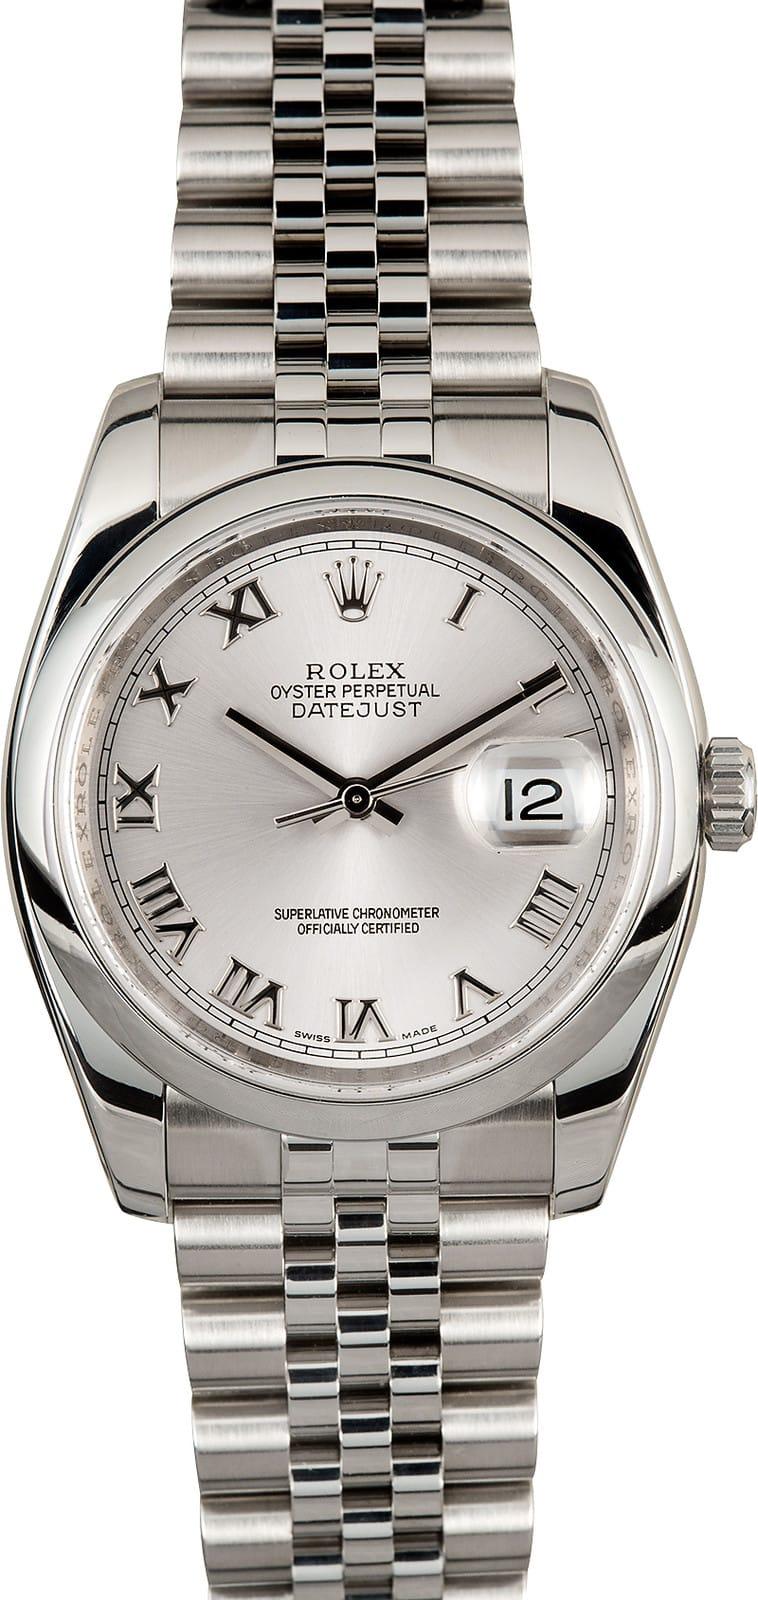 Vintage Tudor Watches >> Rolex Datejust Stainless 116200